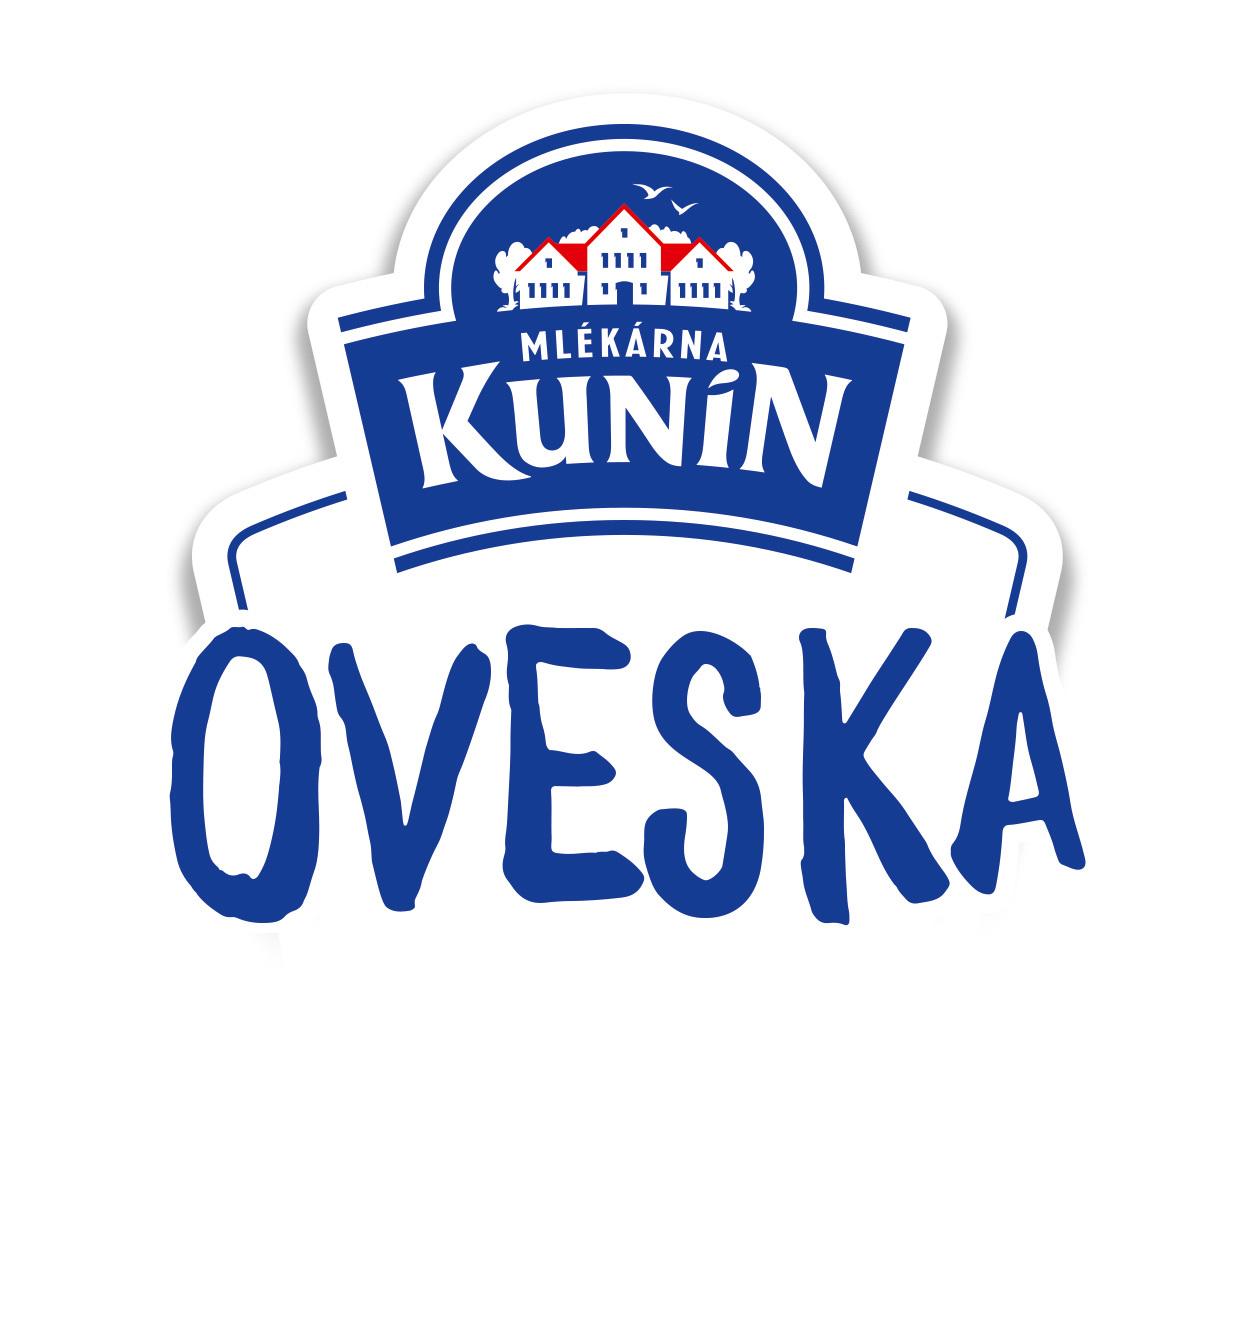 Bildmarke: Mlékárna Kunín Oveska